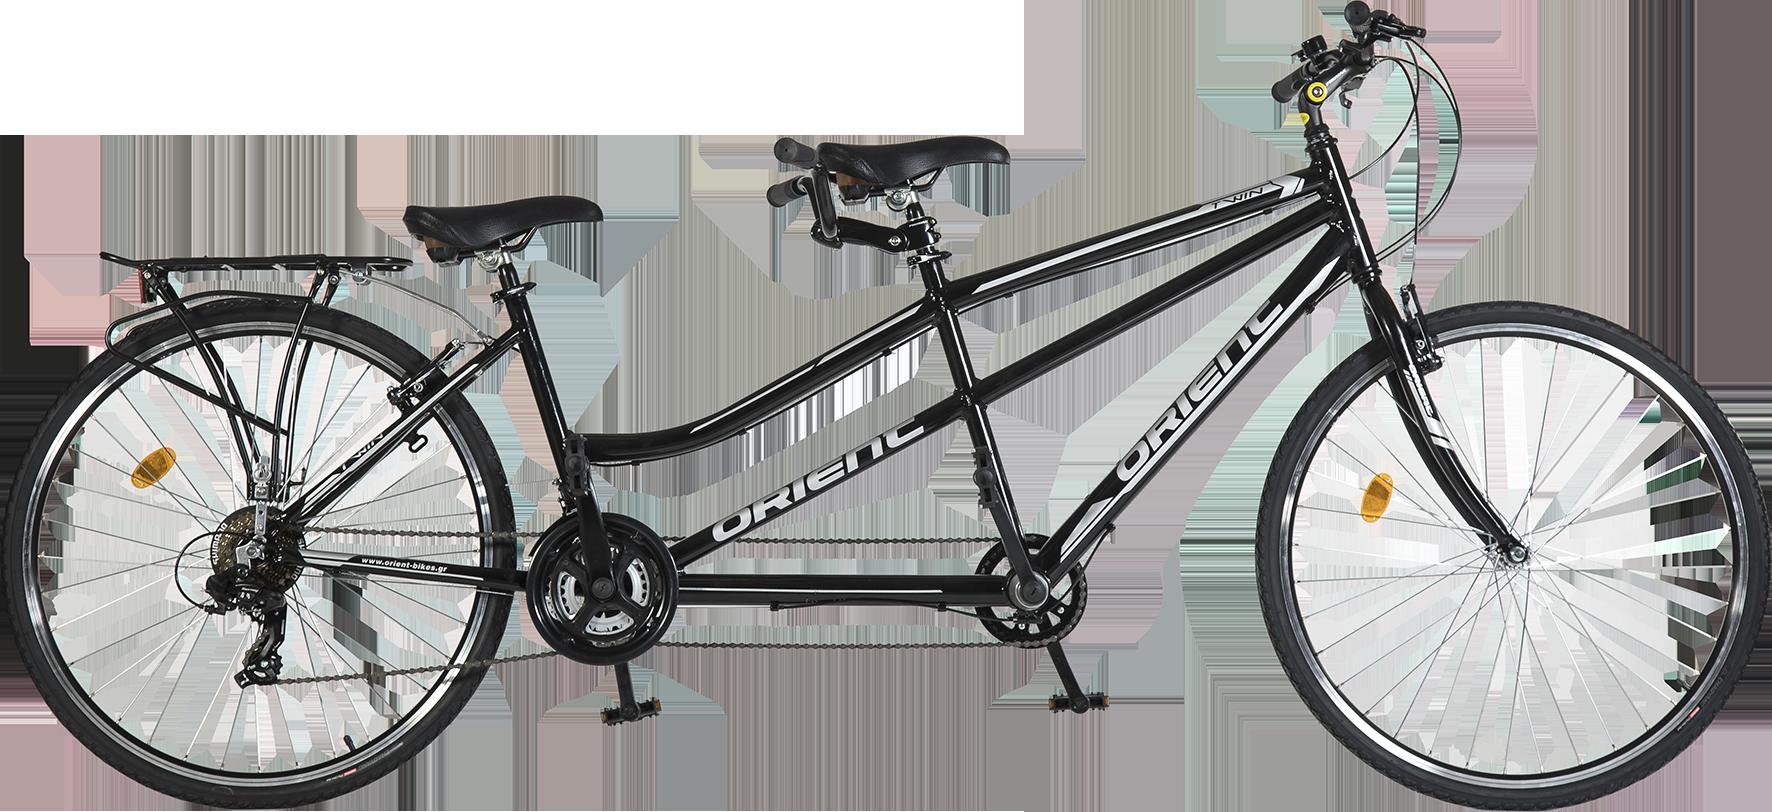 TWIN tandem 21sp. bike image